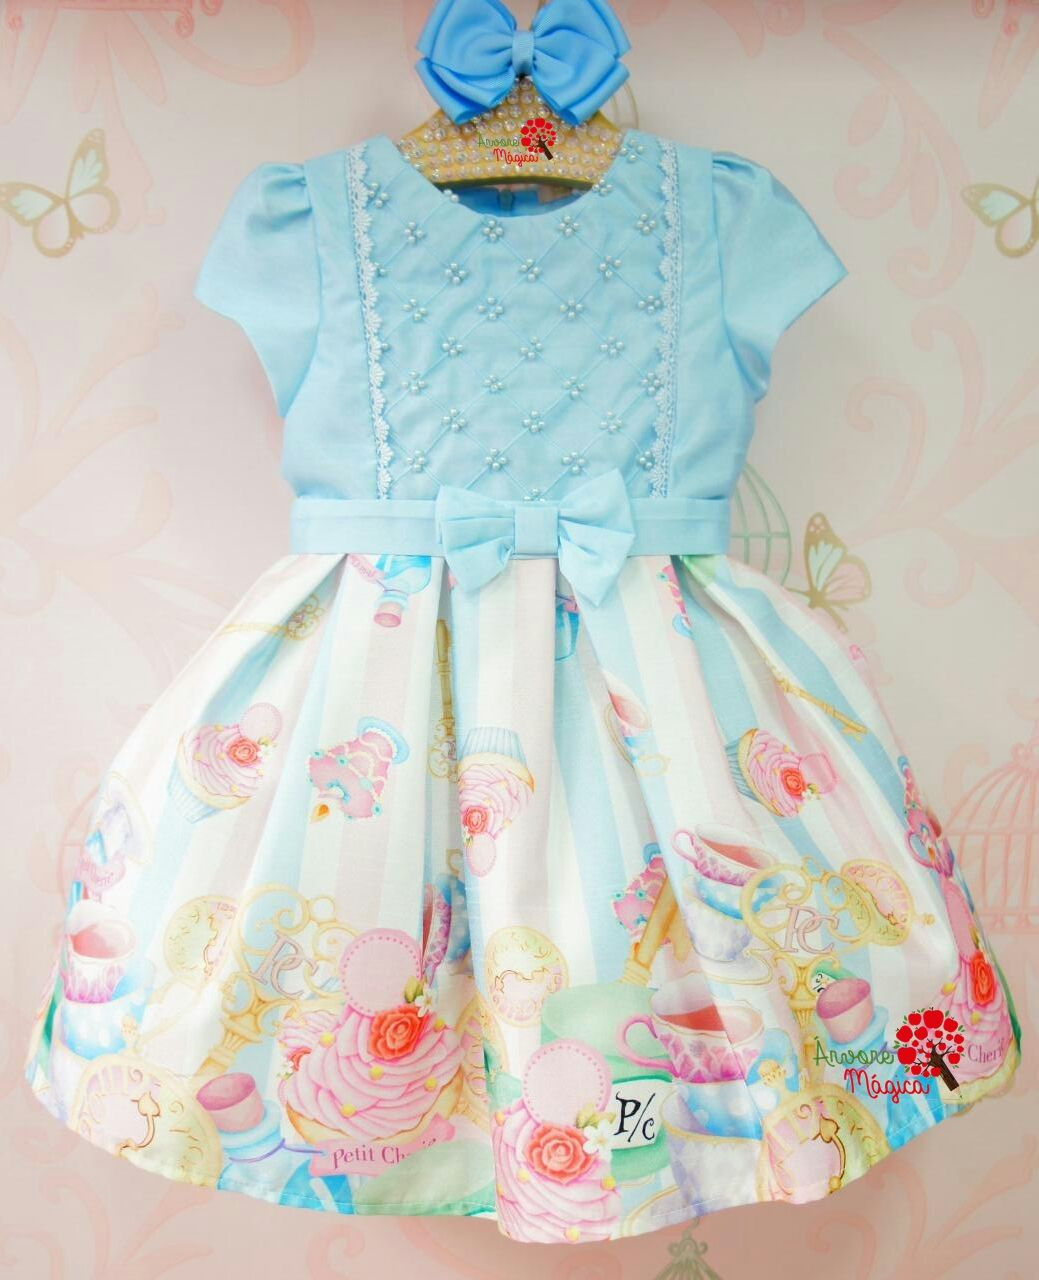 1b93c554c0b9 Vestido de Festa Infantil Confeitaria da Alice Petit Cherie ...